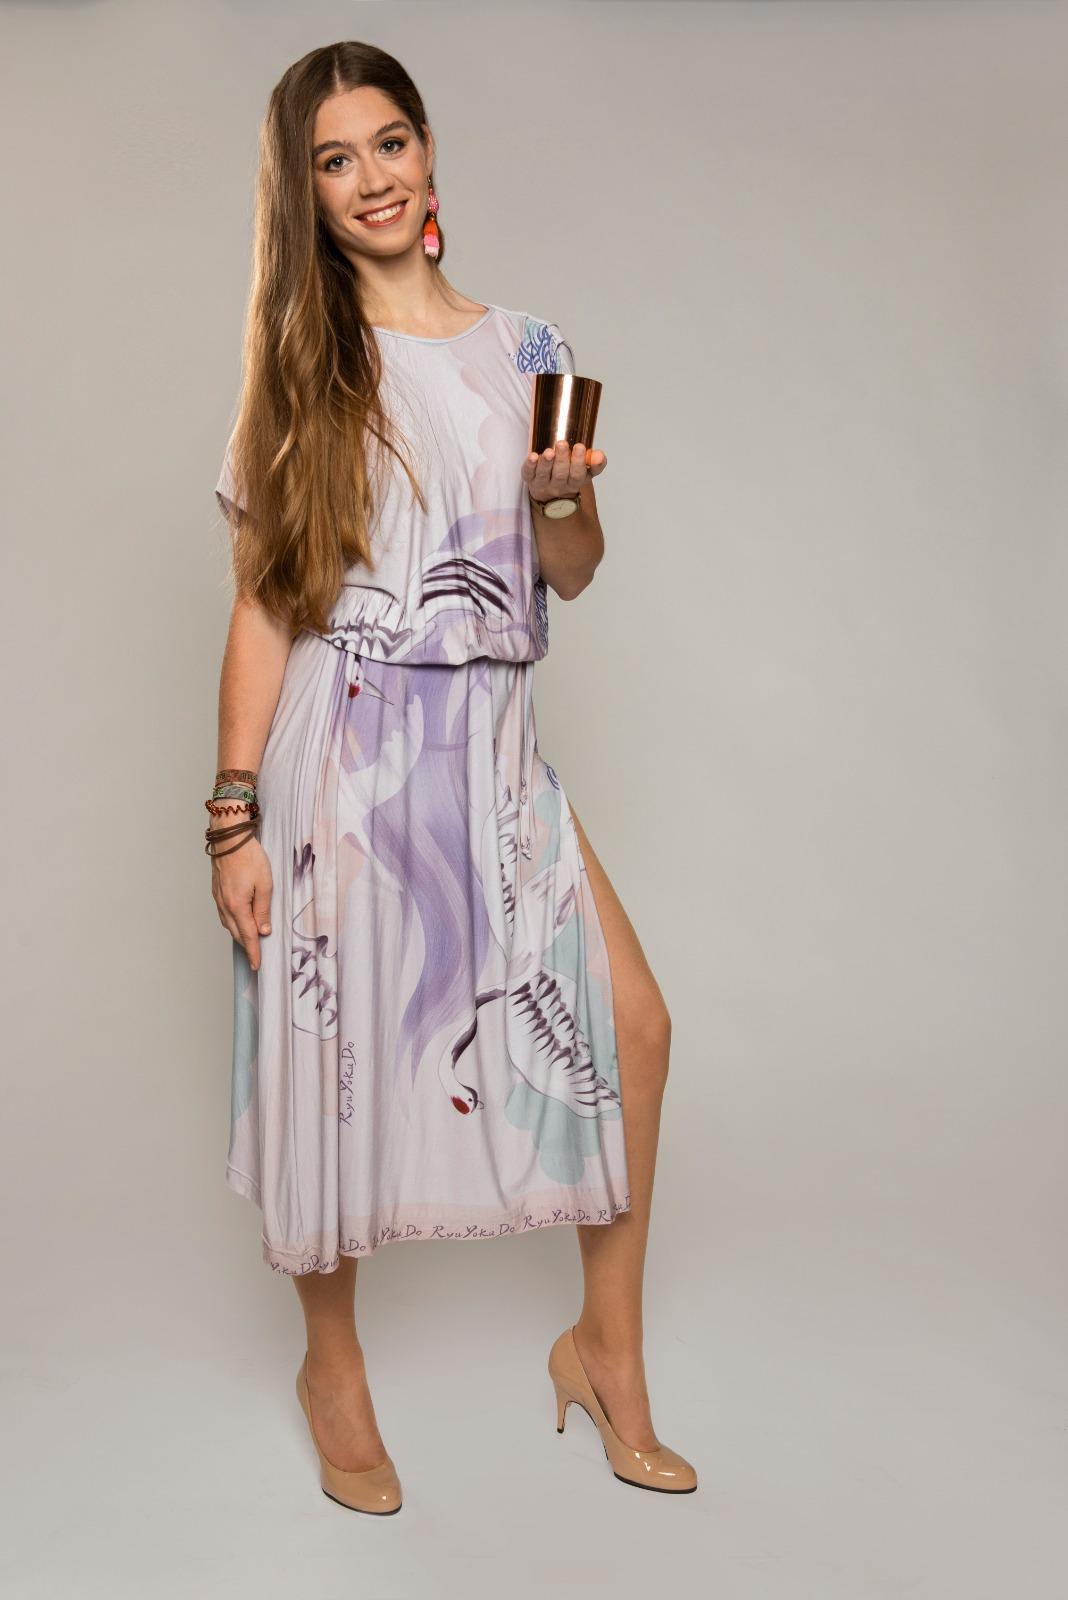 AhA-Silhouette Maxi-Kleid 'Shirueto'